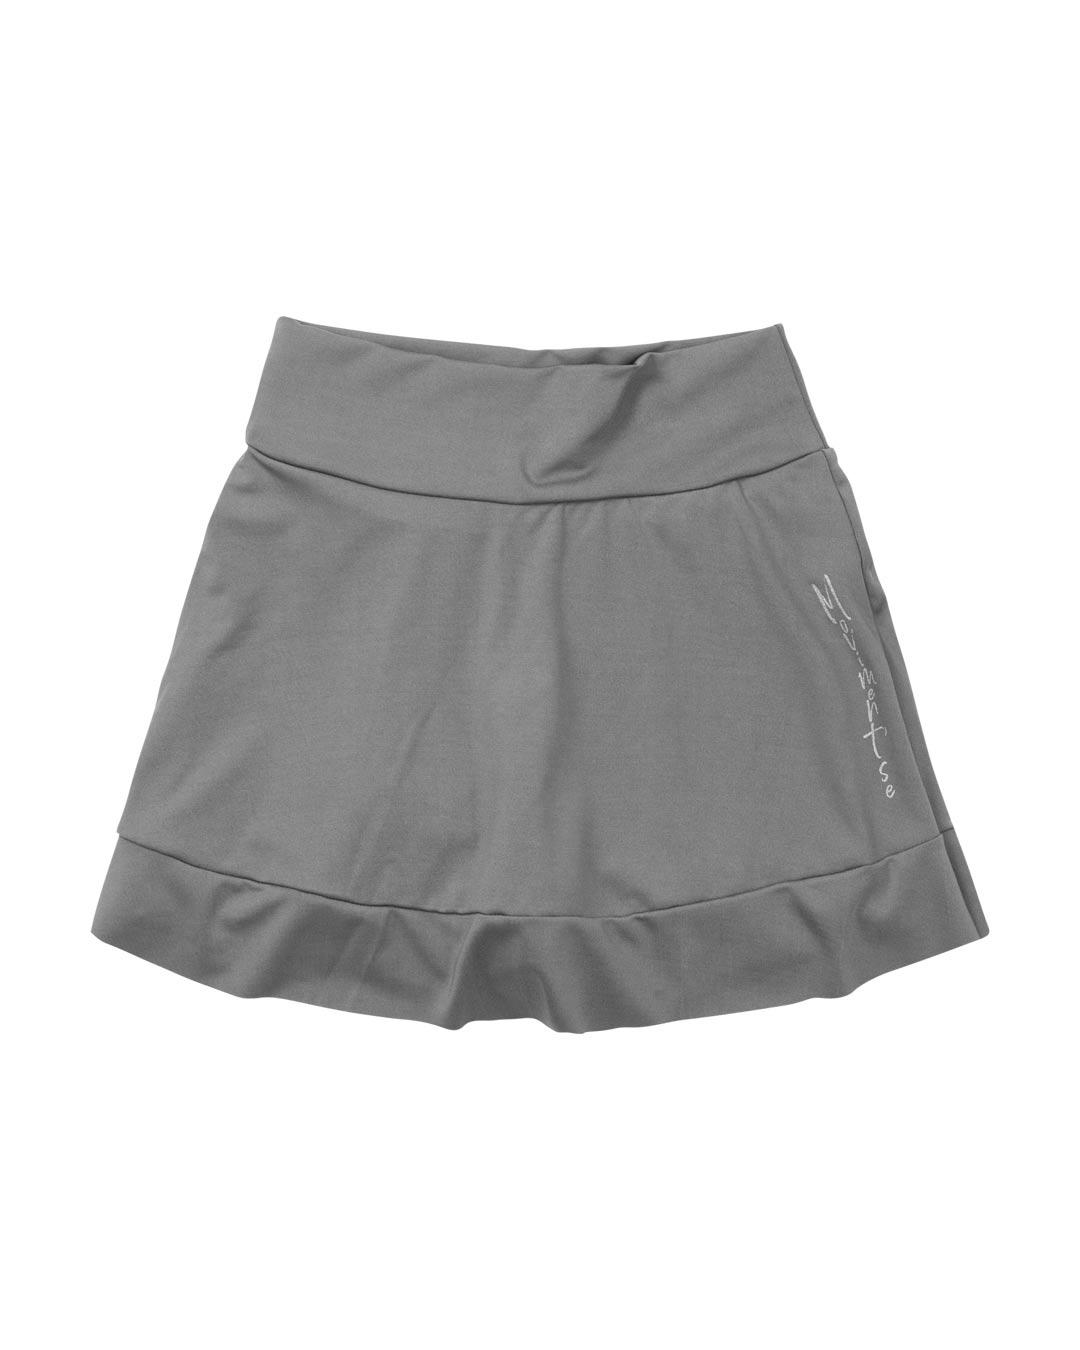 Shorts Saia Fitness Básico Mescla - Movimente-se